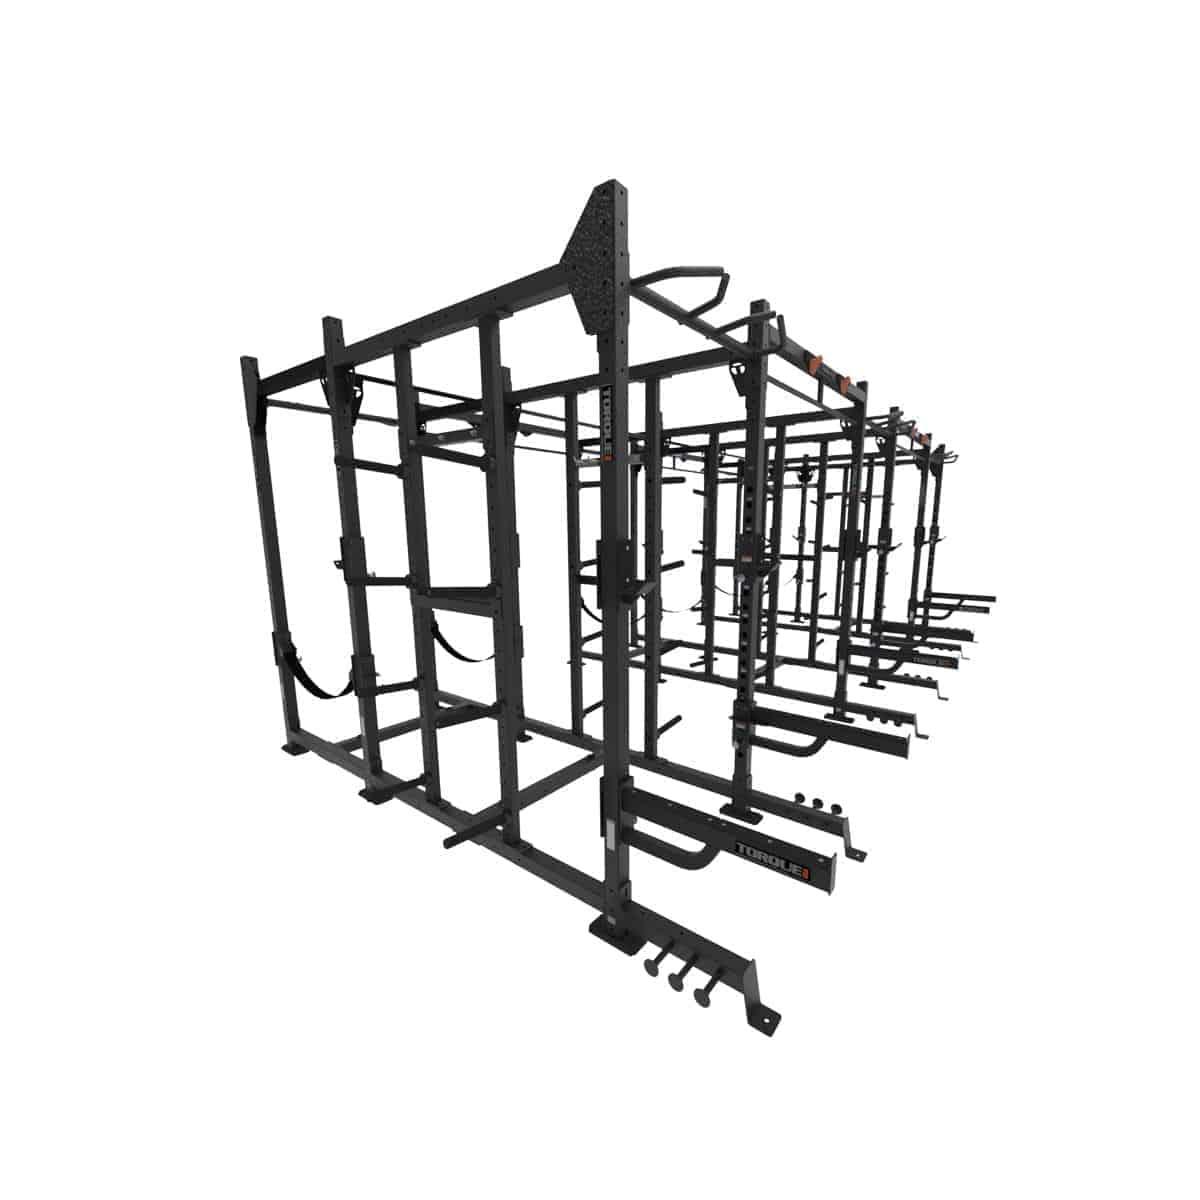 24 X 10 Foot Siege Storage Combination Rack - X1 Package